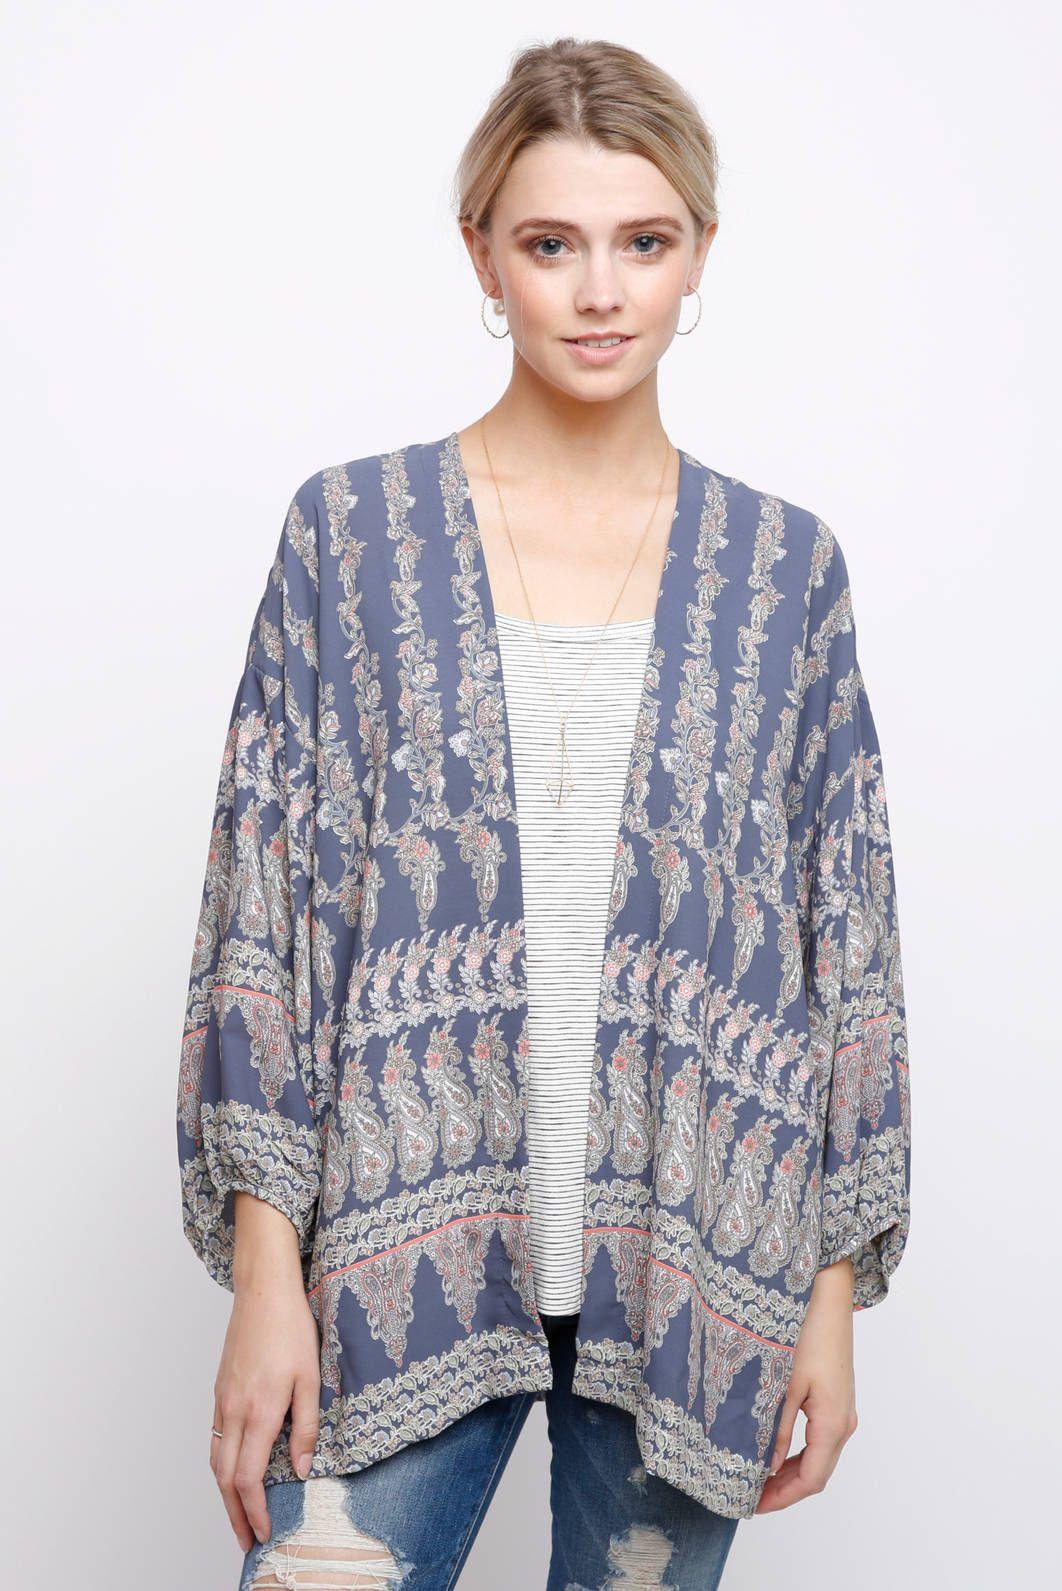 Audrey 3+1 Paisley Print Kimono - feeling blue